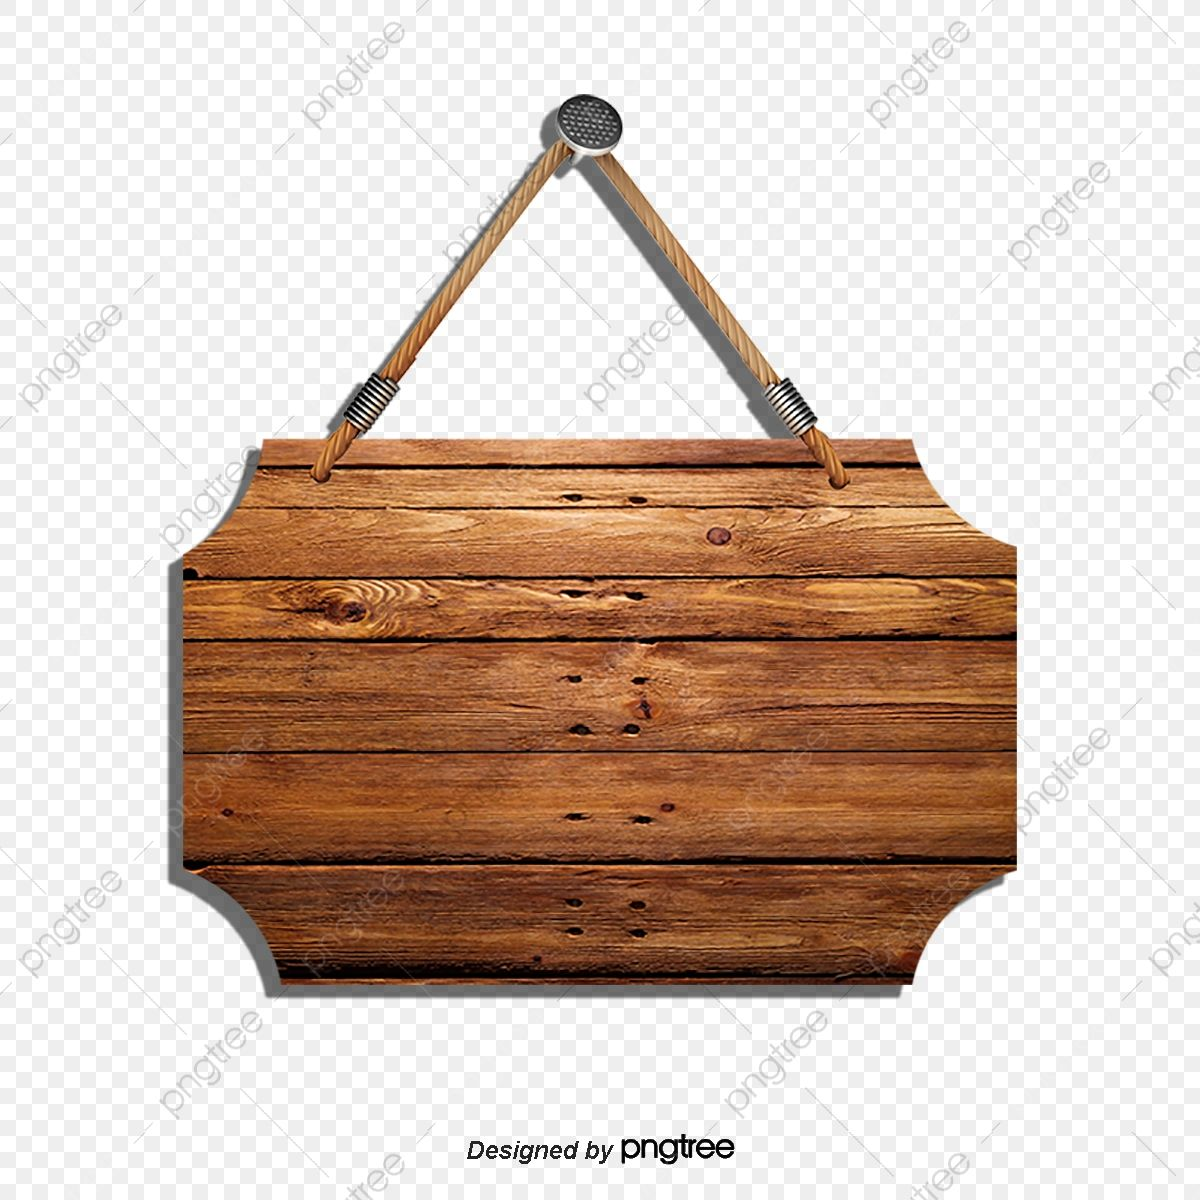 Placa De Madeira Assinar Clipart Madeira Marca Imagem Png E Psd Para Download Gratuito Wooden Signs Wood Board Signs Clip Art